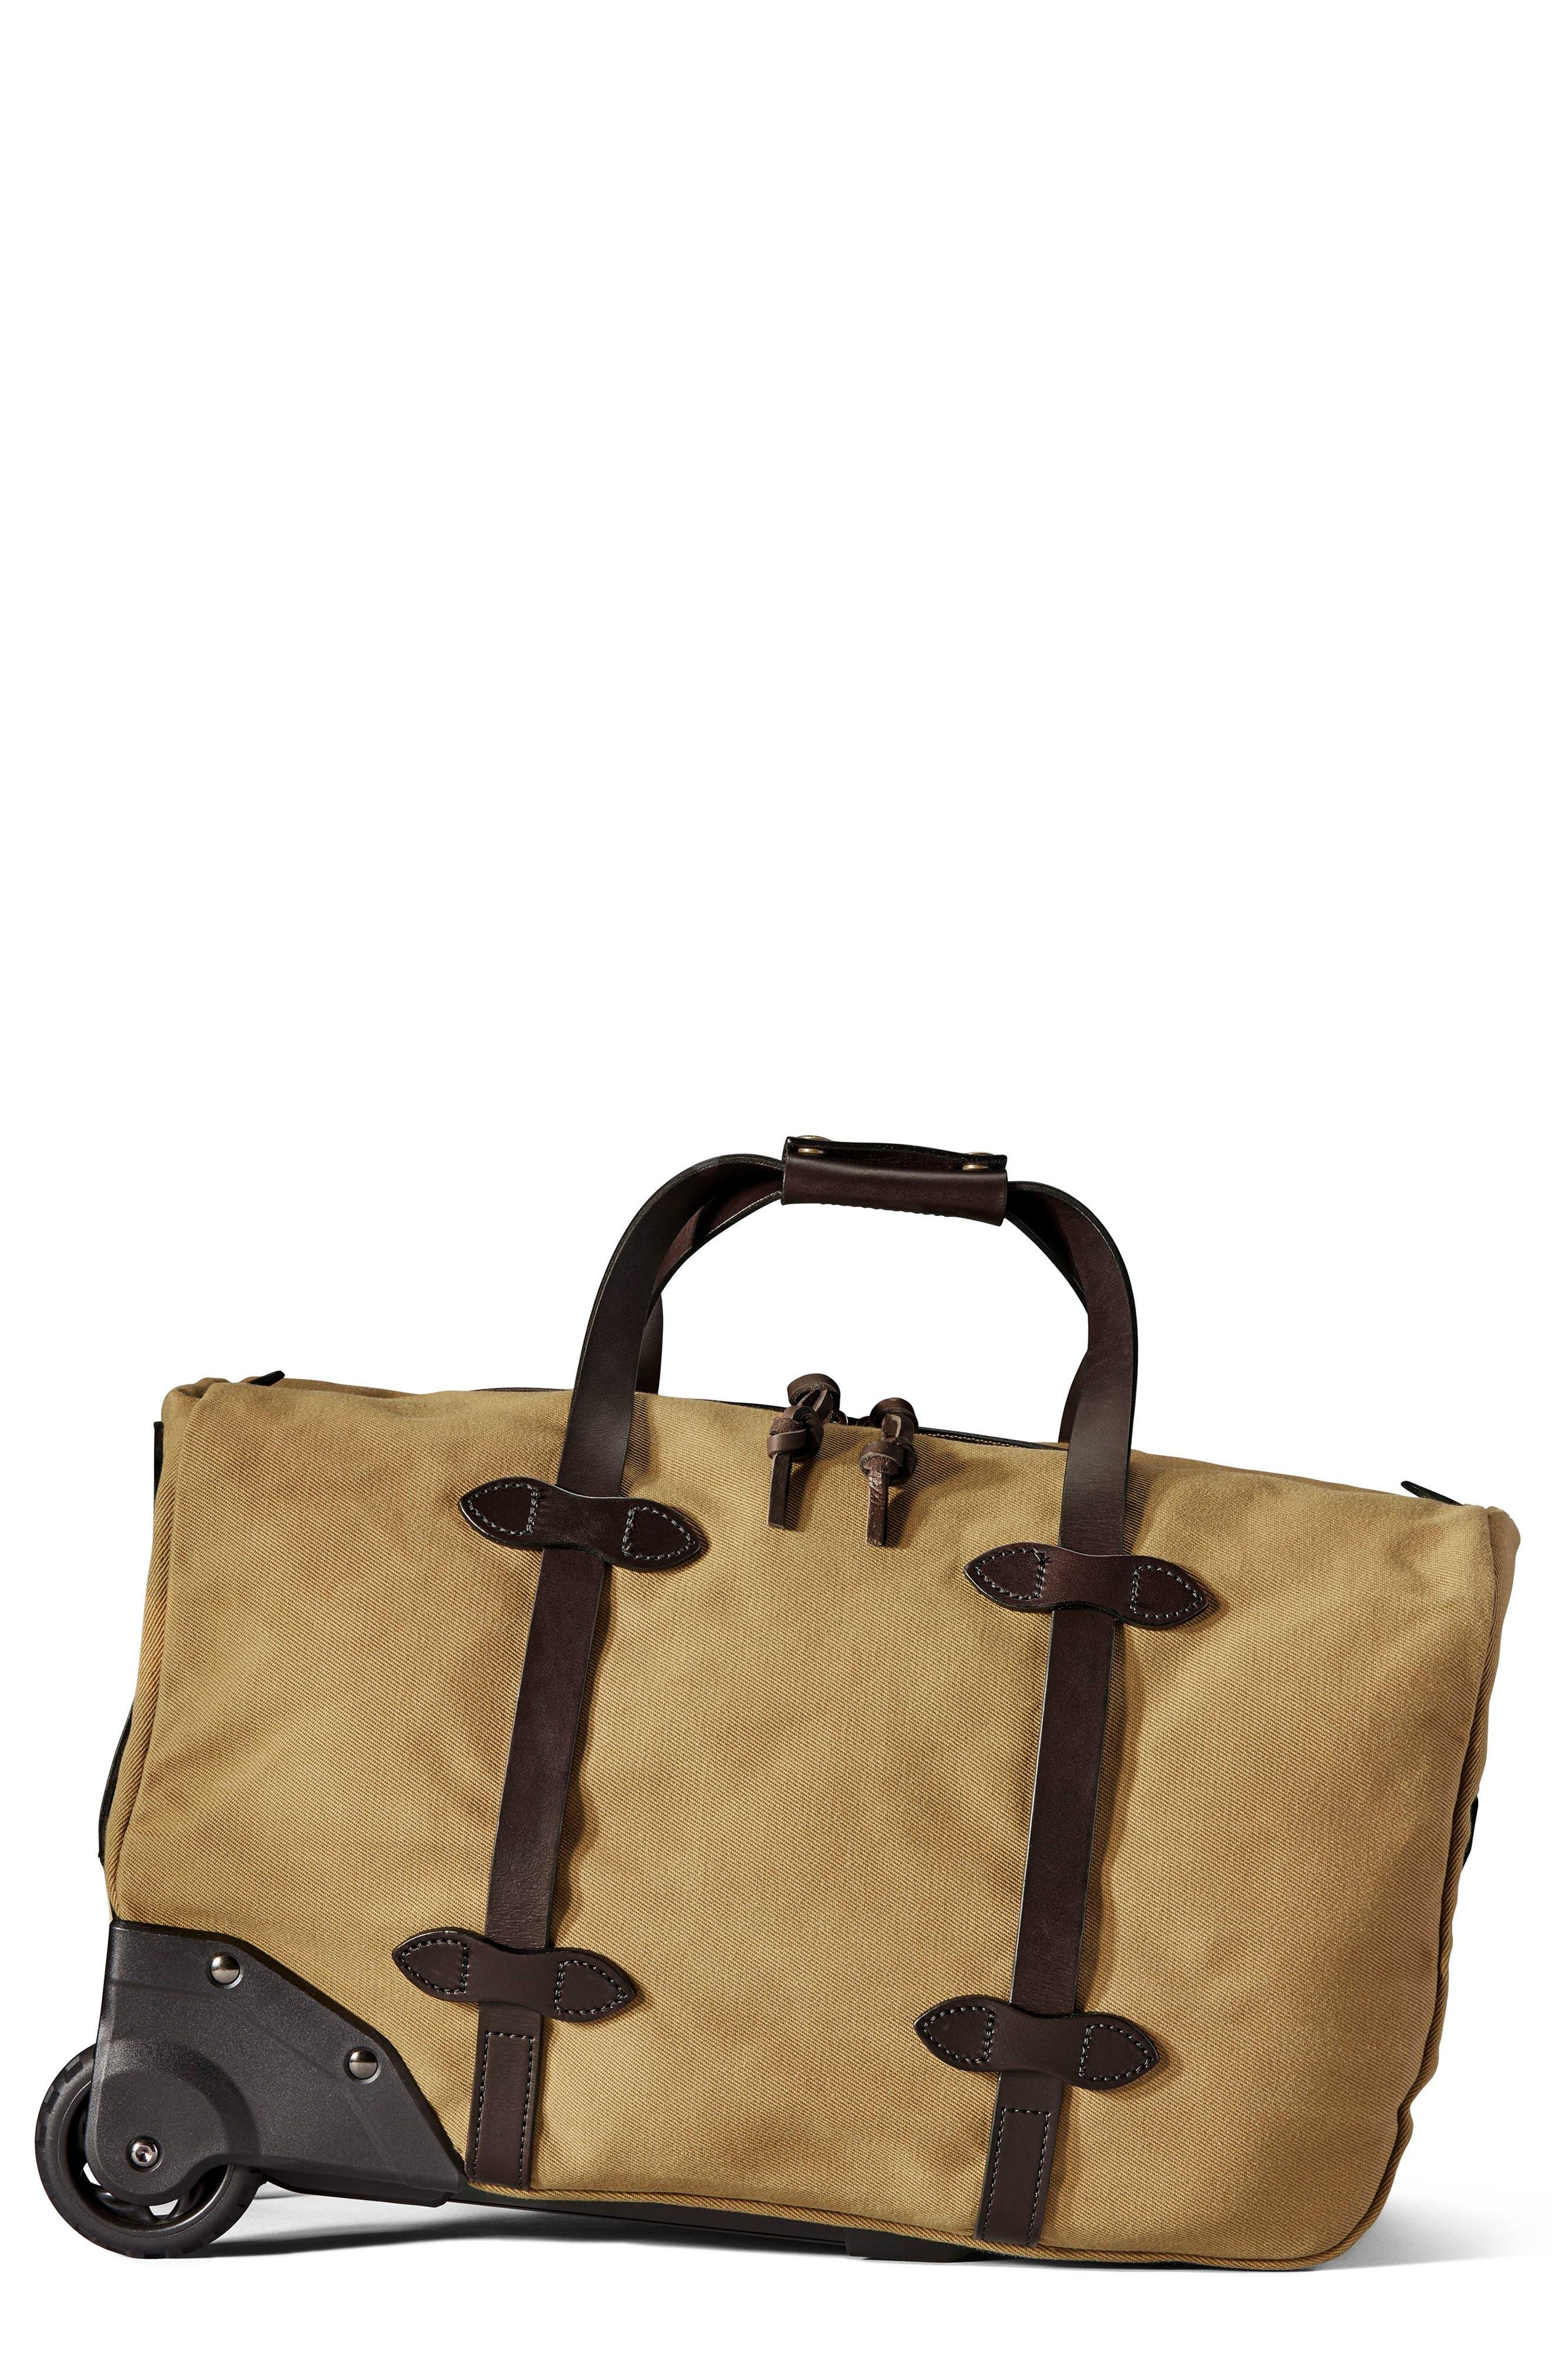 FILSON,                             Small Rolling Duffel Bag,                             Main thumbnail 1, color,                             260